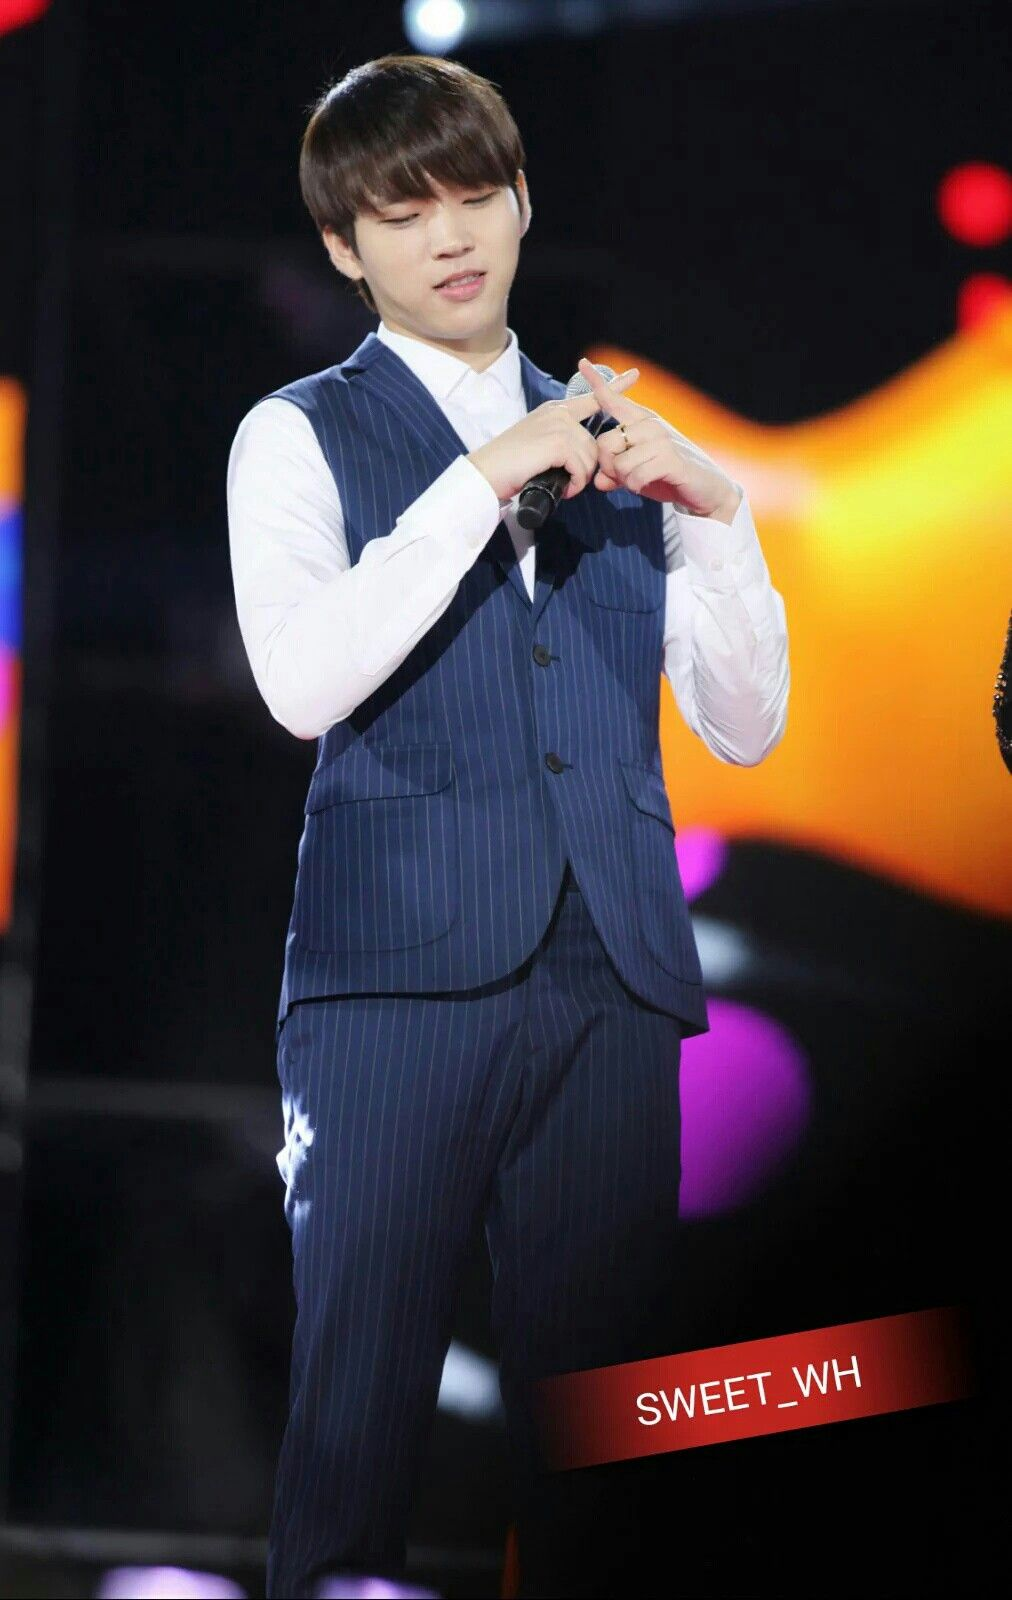 160618 #Woohyun Thank you Festival Concert